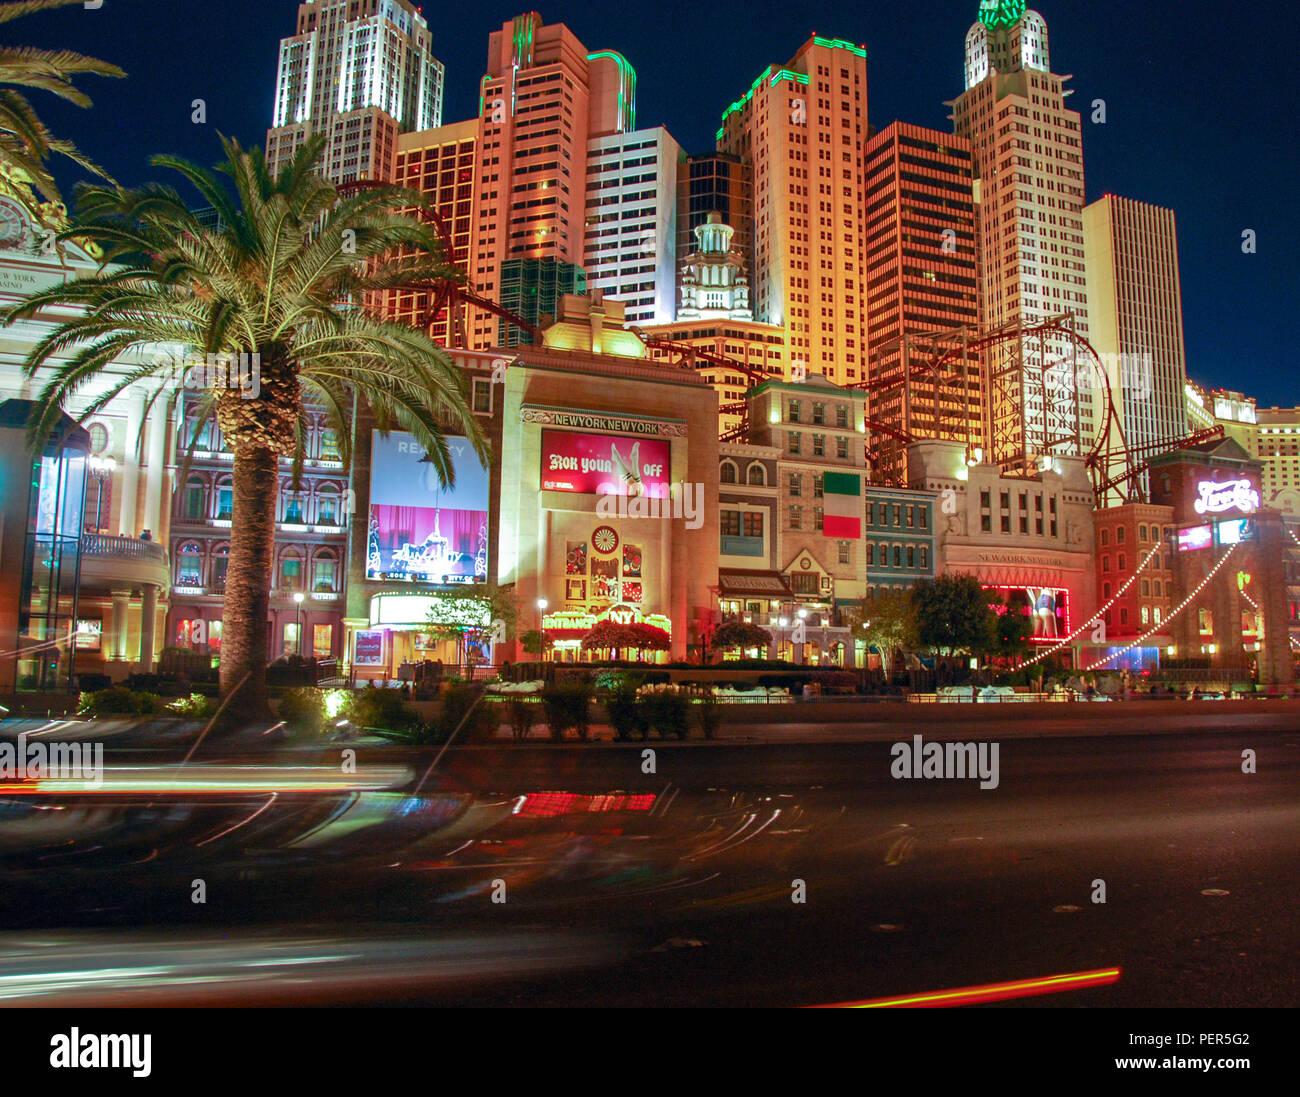 The New York New York hotel in Las Vegas at night - Stock Image